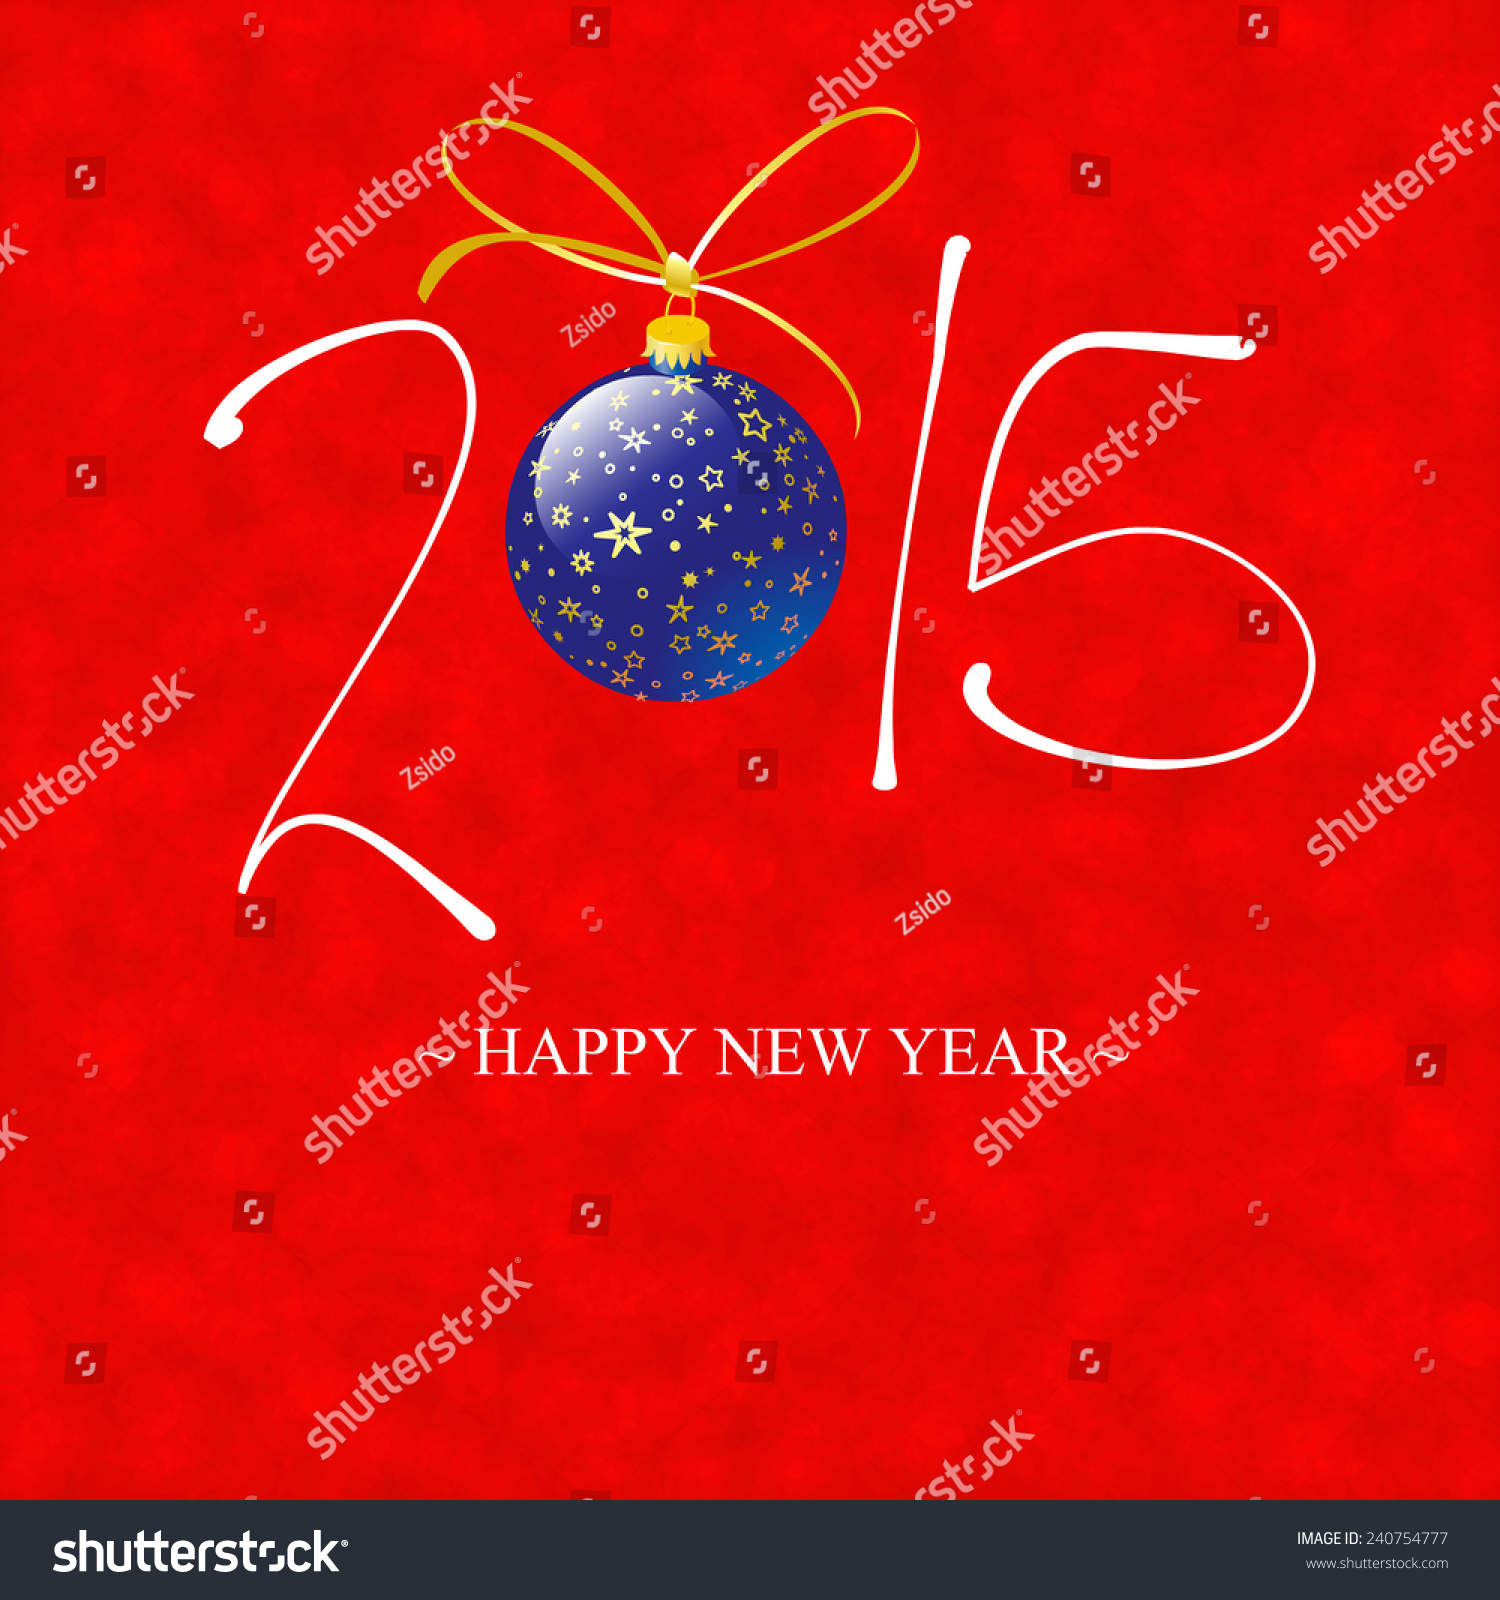 Happy New Year Card 2015 Illustration Stock Illustration Royalty